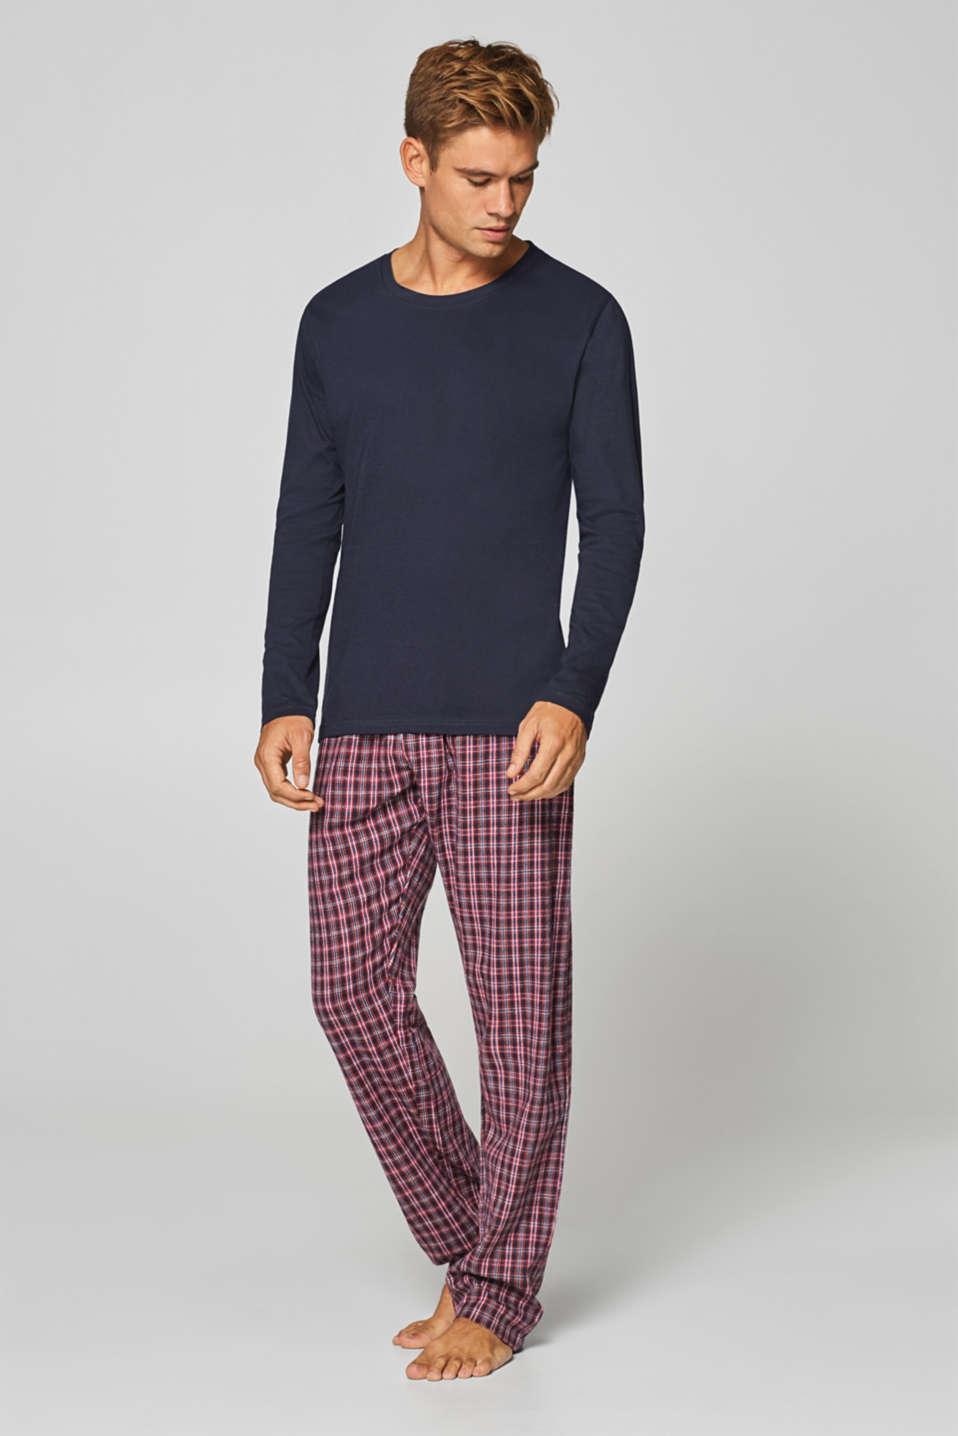 30652a34 Esprit - Pyjamas with flannel bottoms, 100% cotton at our Online Shop